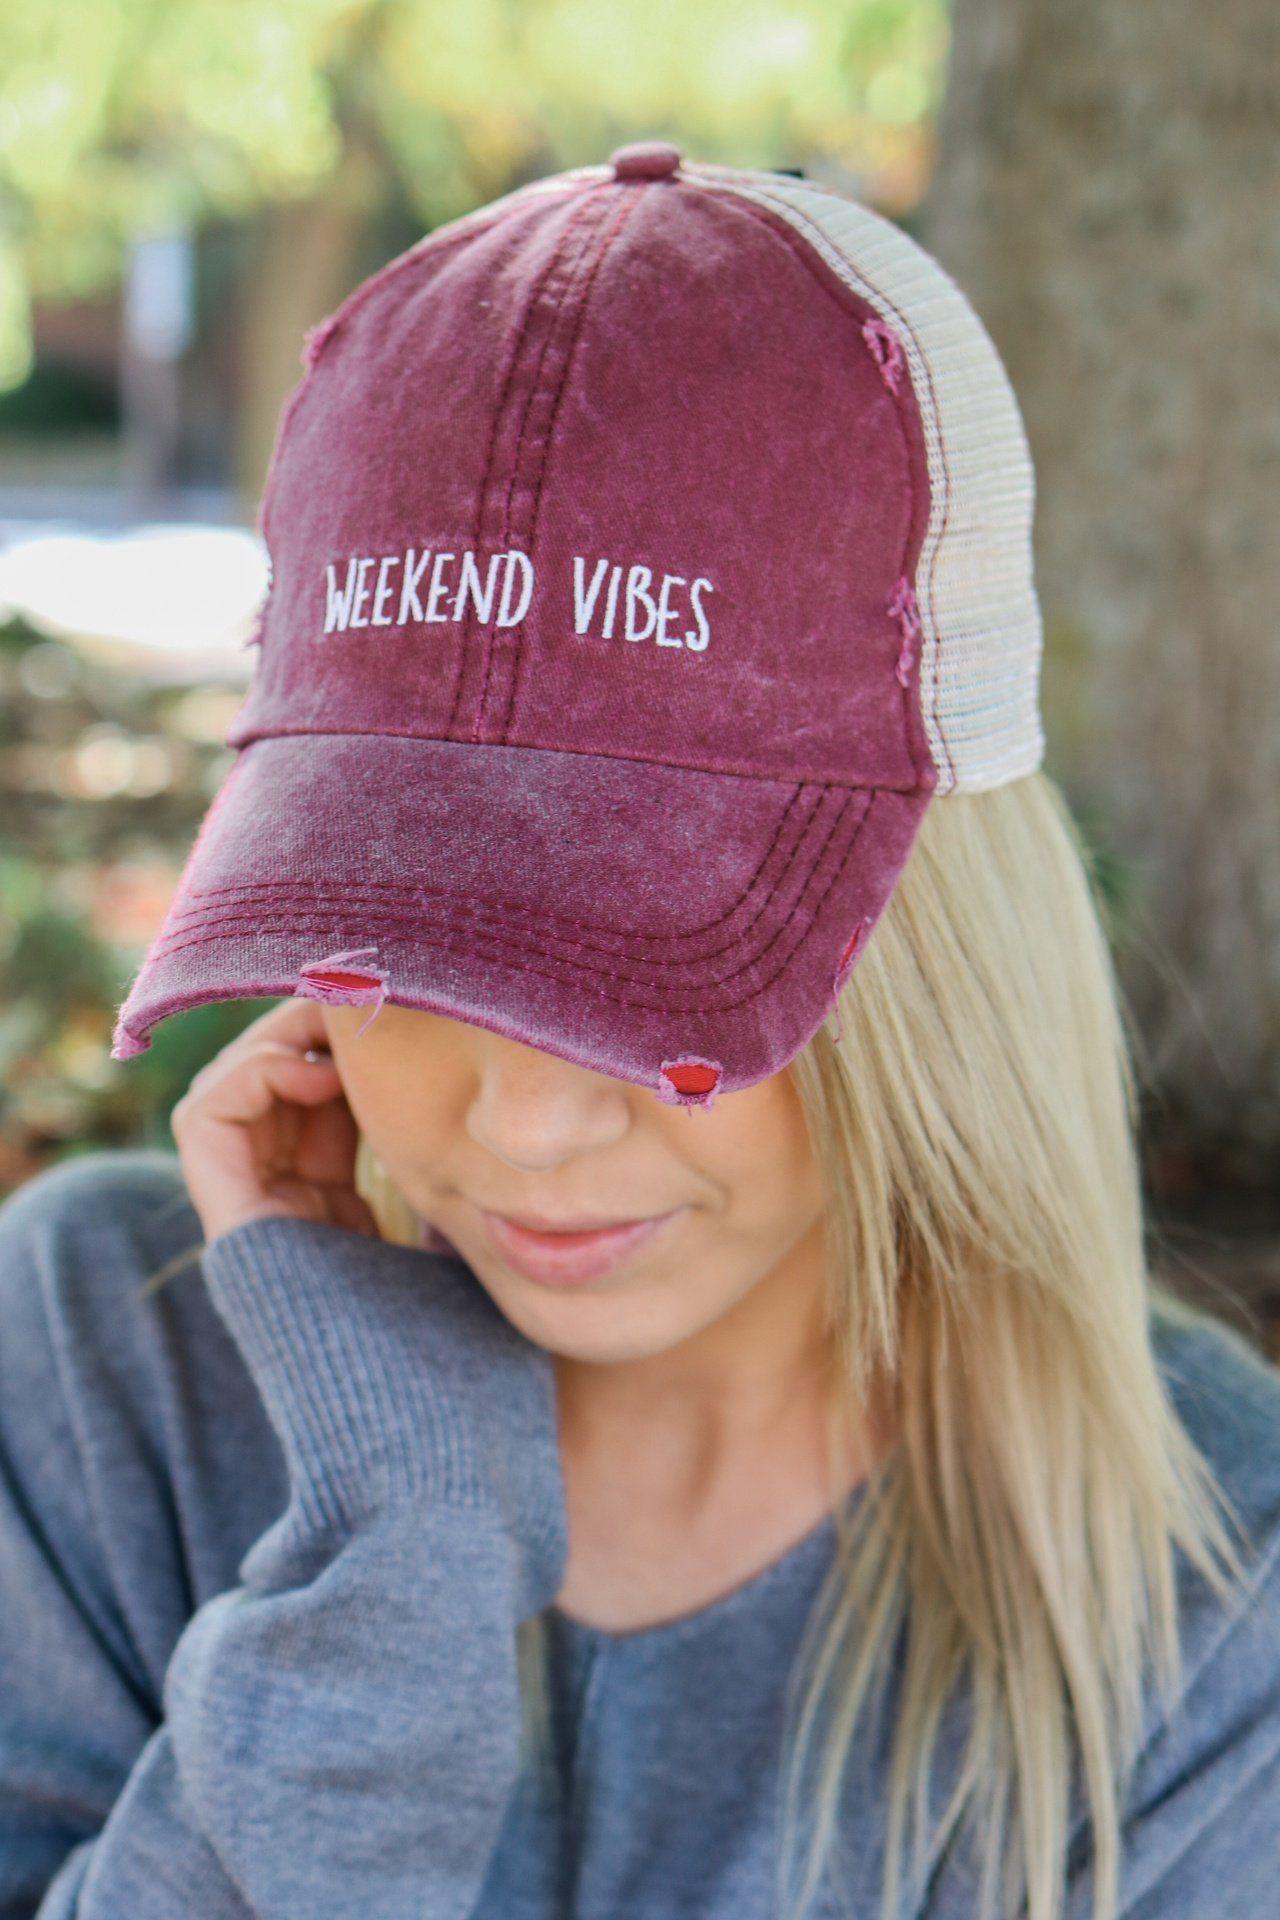 ceee26052e8bb7 Weekend Vibes Baseball Cap | Caps in 2019 | Baseball hats, Hats ...